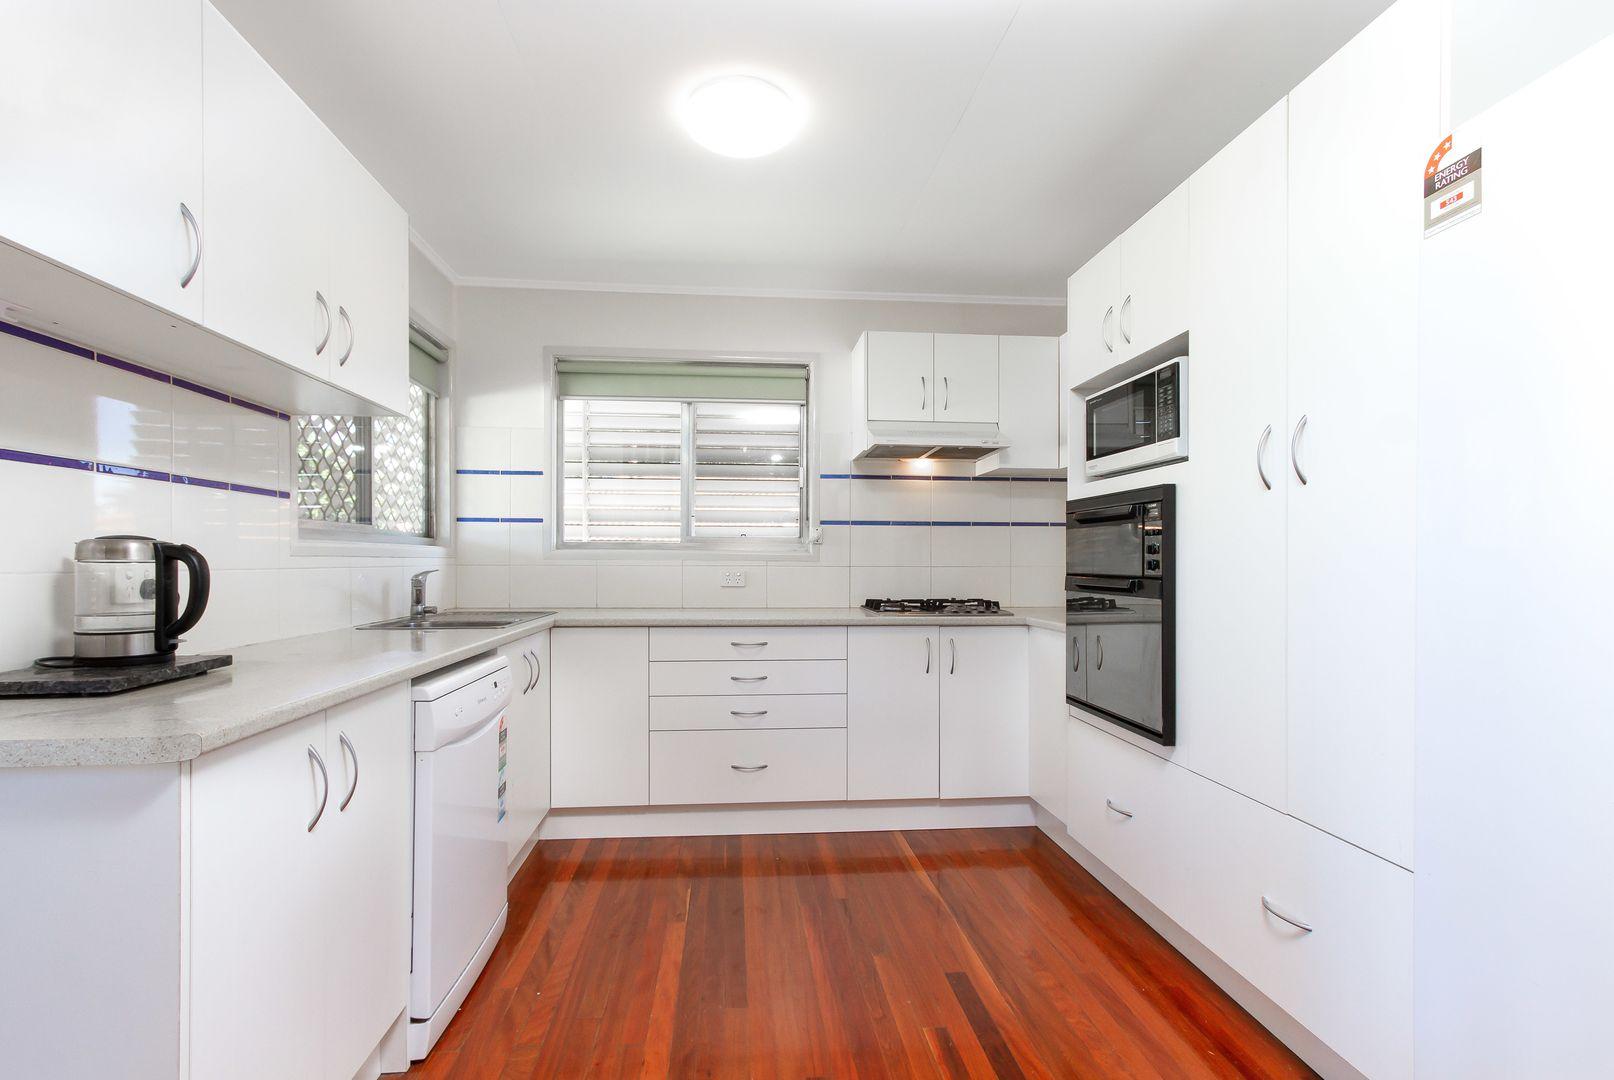 107 Pareena Cres, Mansfield QLD 4122, Image 1